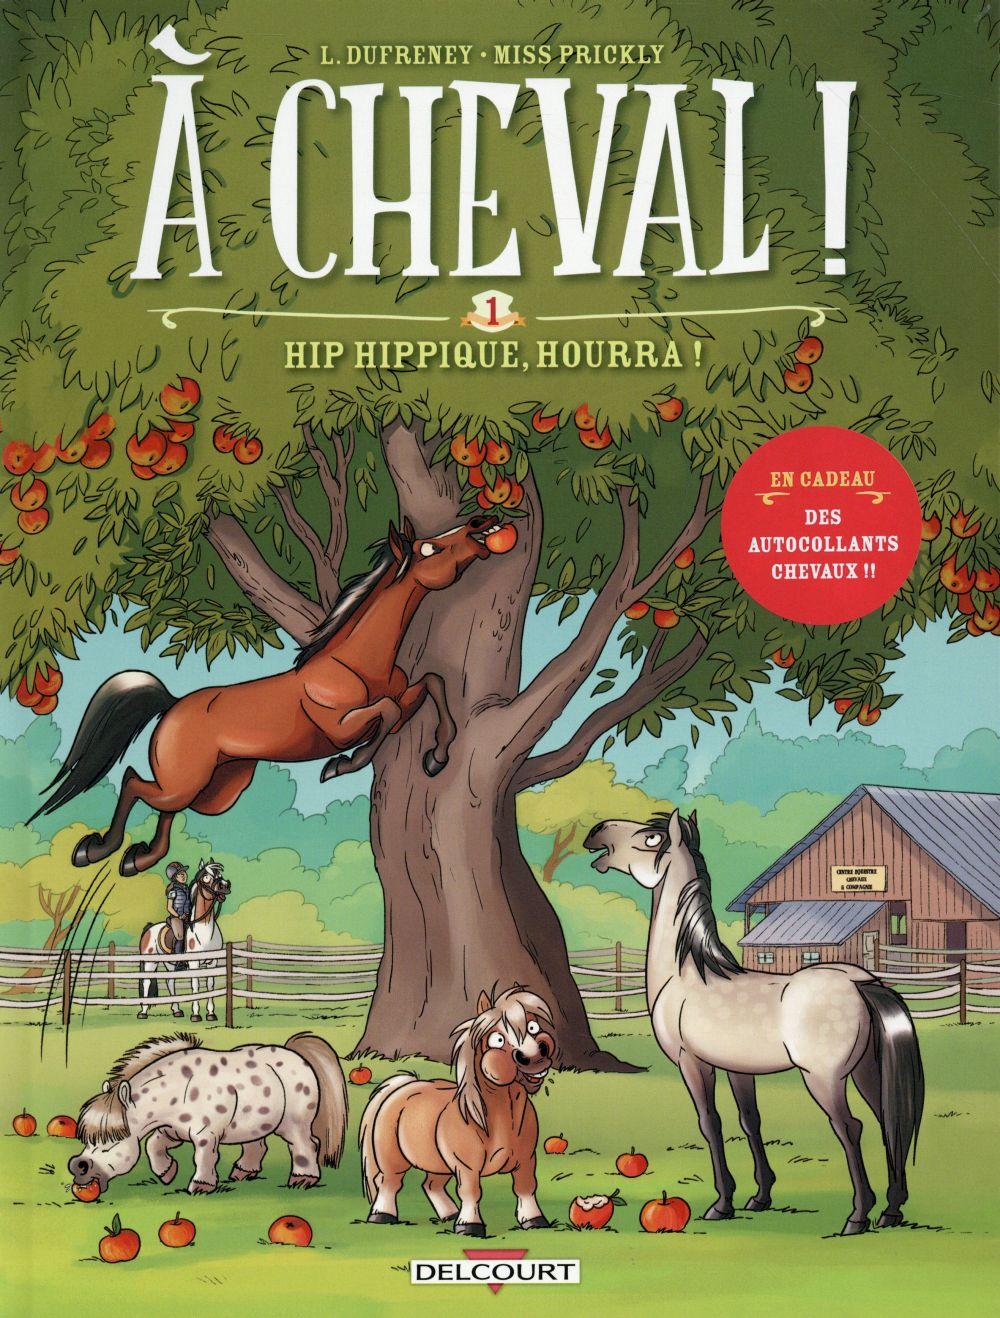 A CHEVAL ! T.1  -  HIP HIPPIQUE, HOURRA ! DUFRENEY/PRICKLY Delcourt